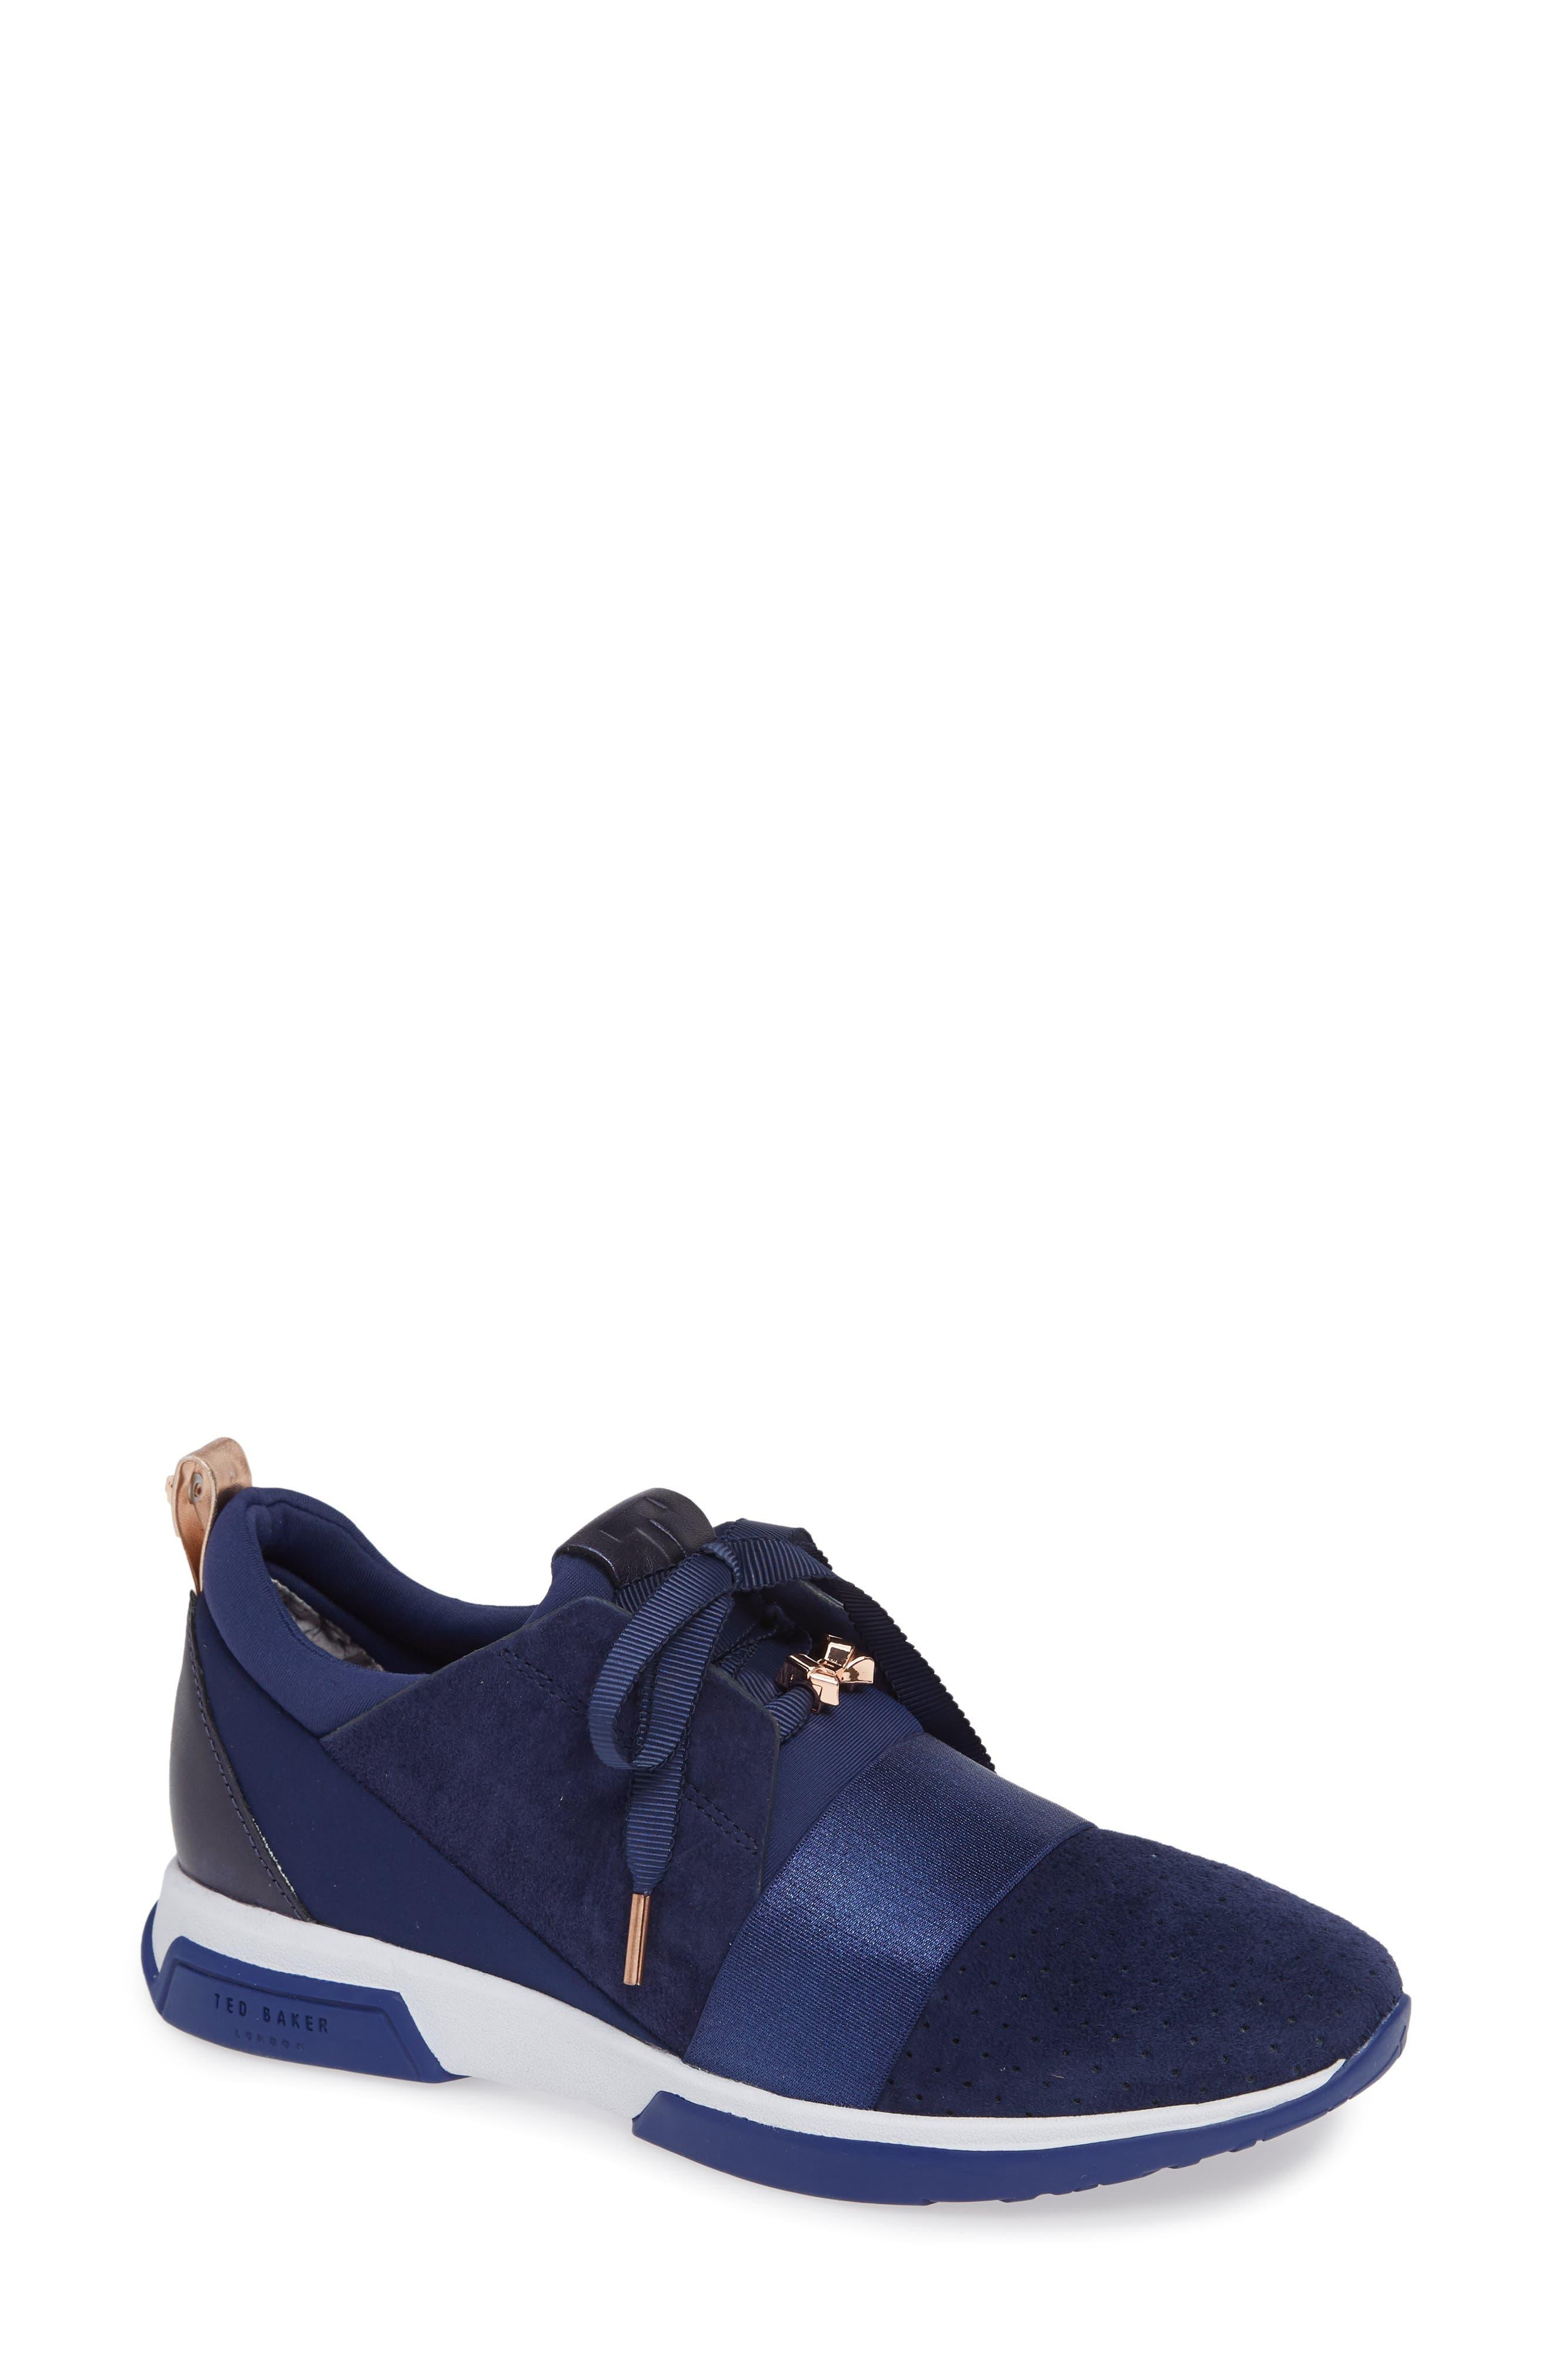 Ted Baker London Cepap 2 Sneaker